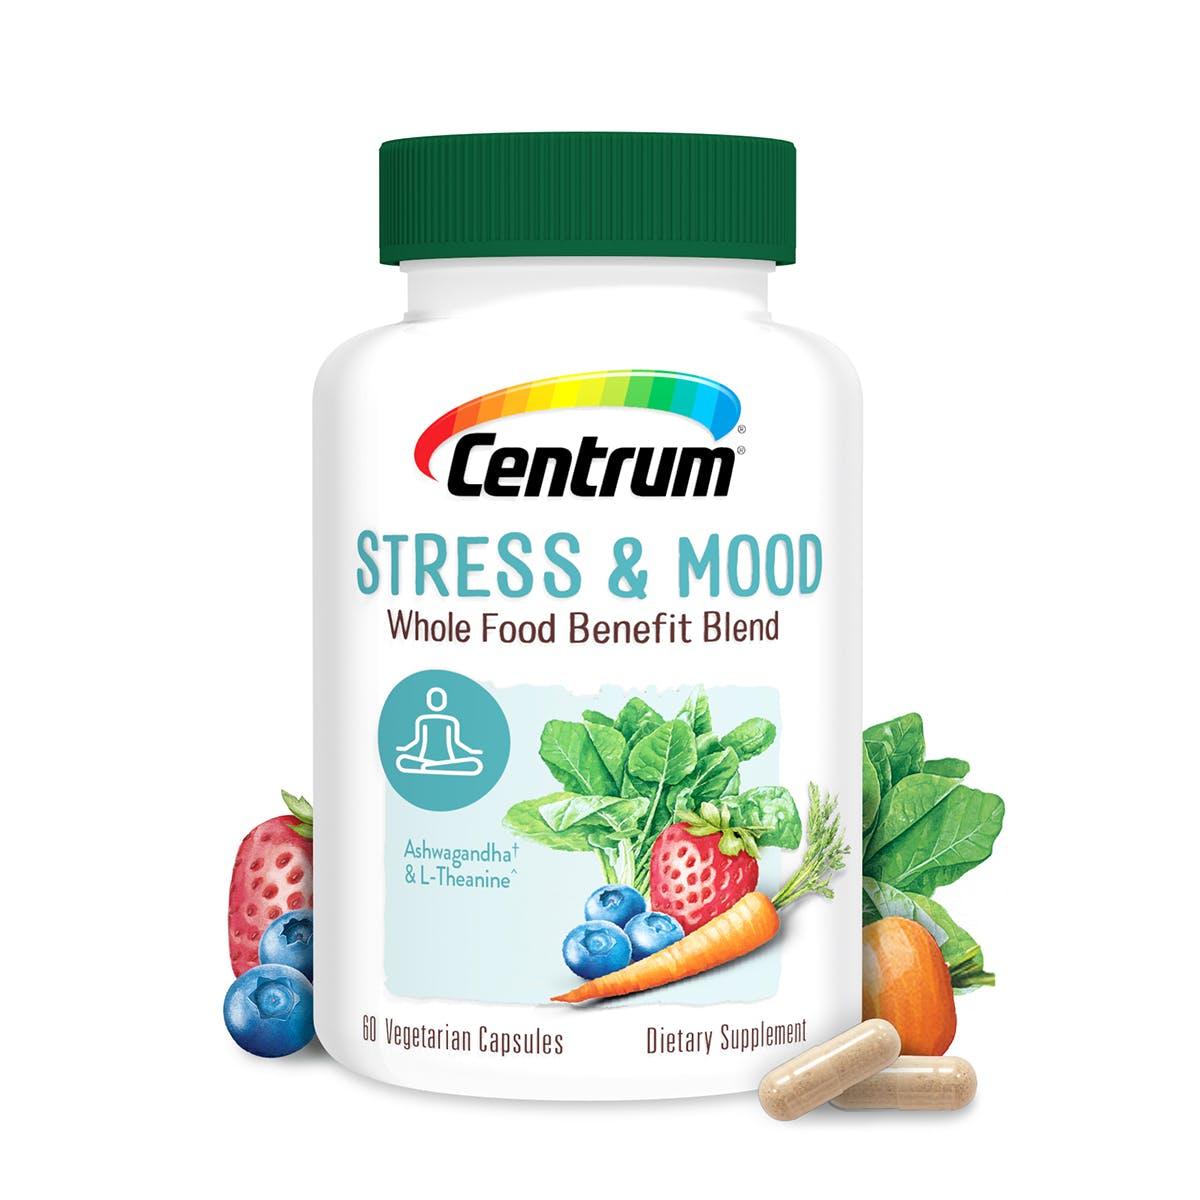 Bottle of Centrum Stress & Mood Whole Food Blend Multivitamin